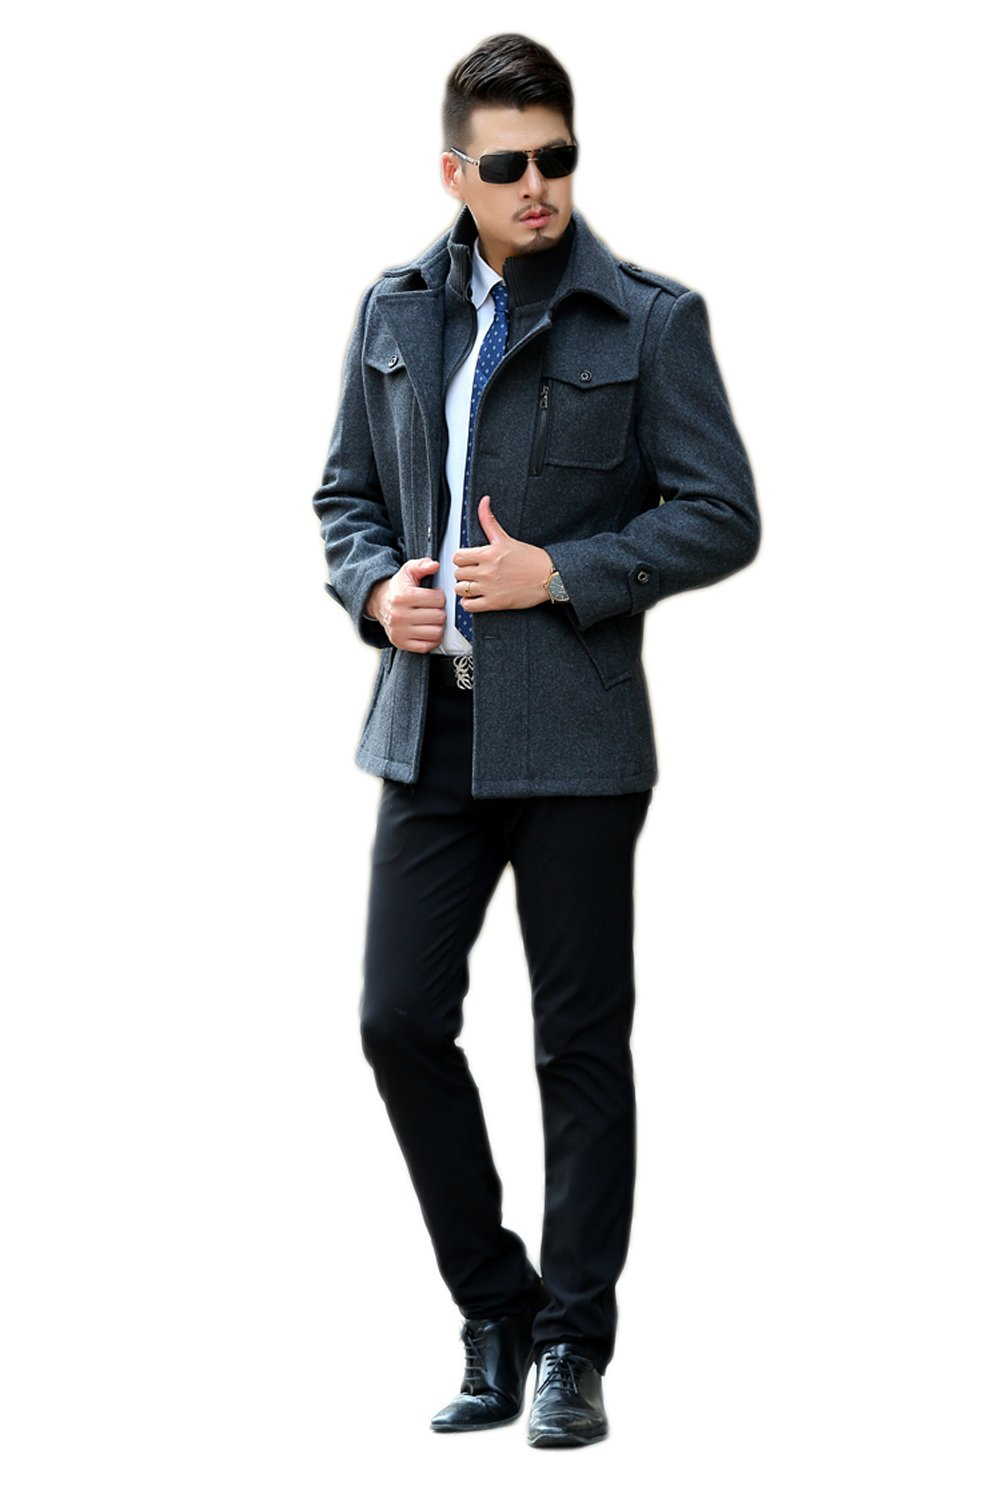 Love Dress Men Winter Wool & Blend Jacket Coat Three Color Blue XXXL